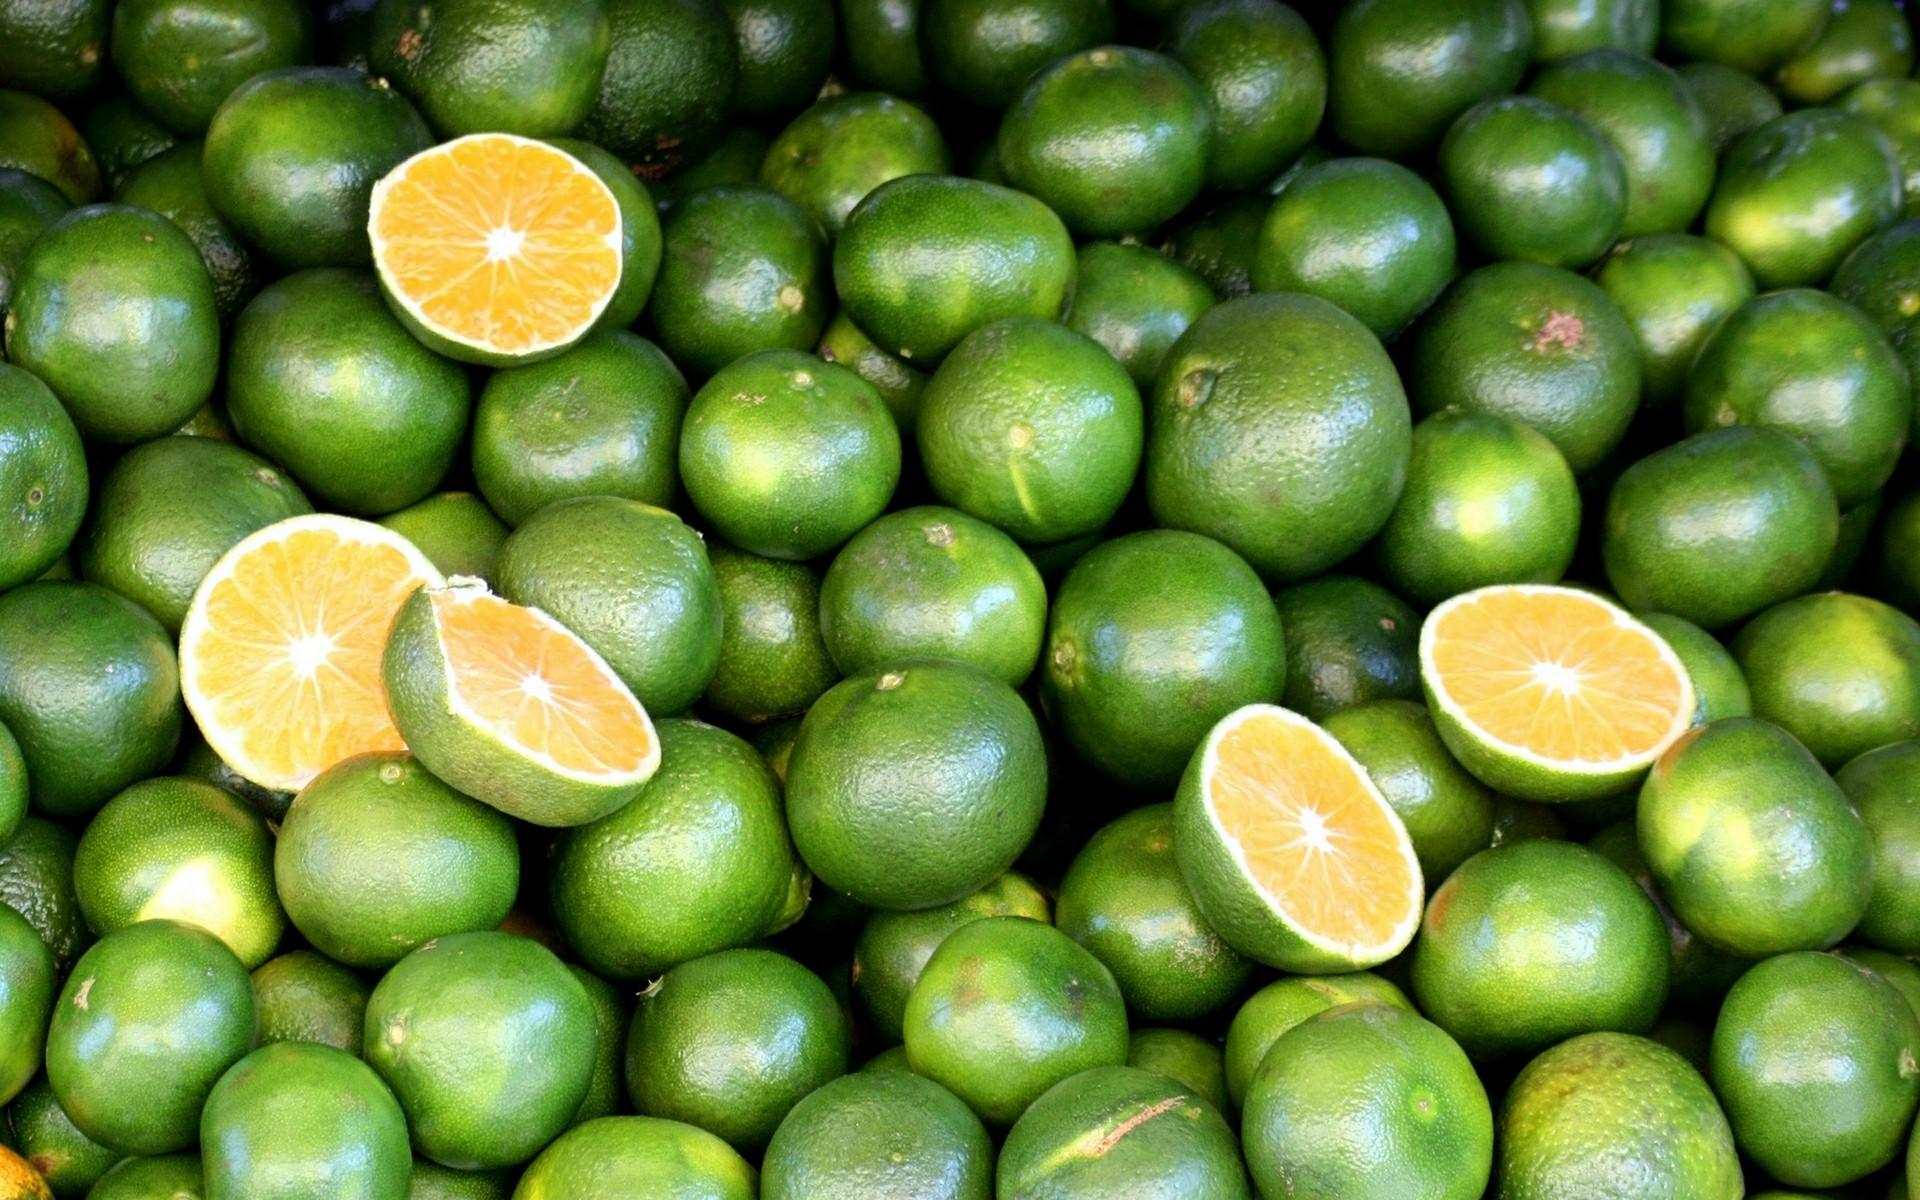 Fond d'écran fruit, agrume, citron vert - Lime wallpaper